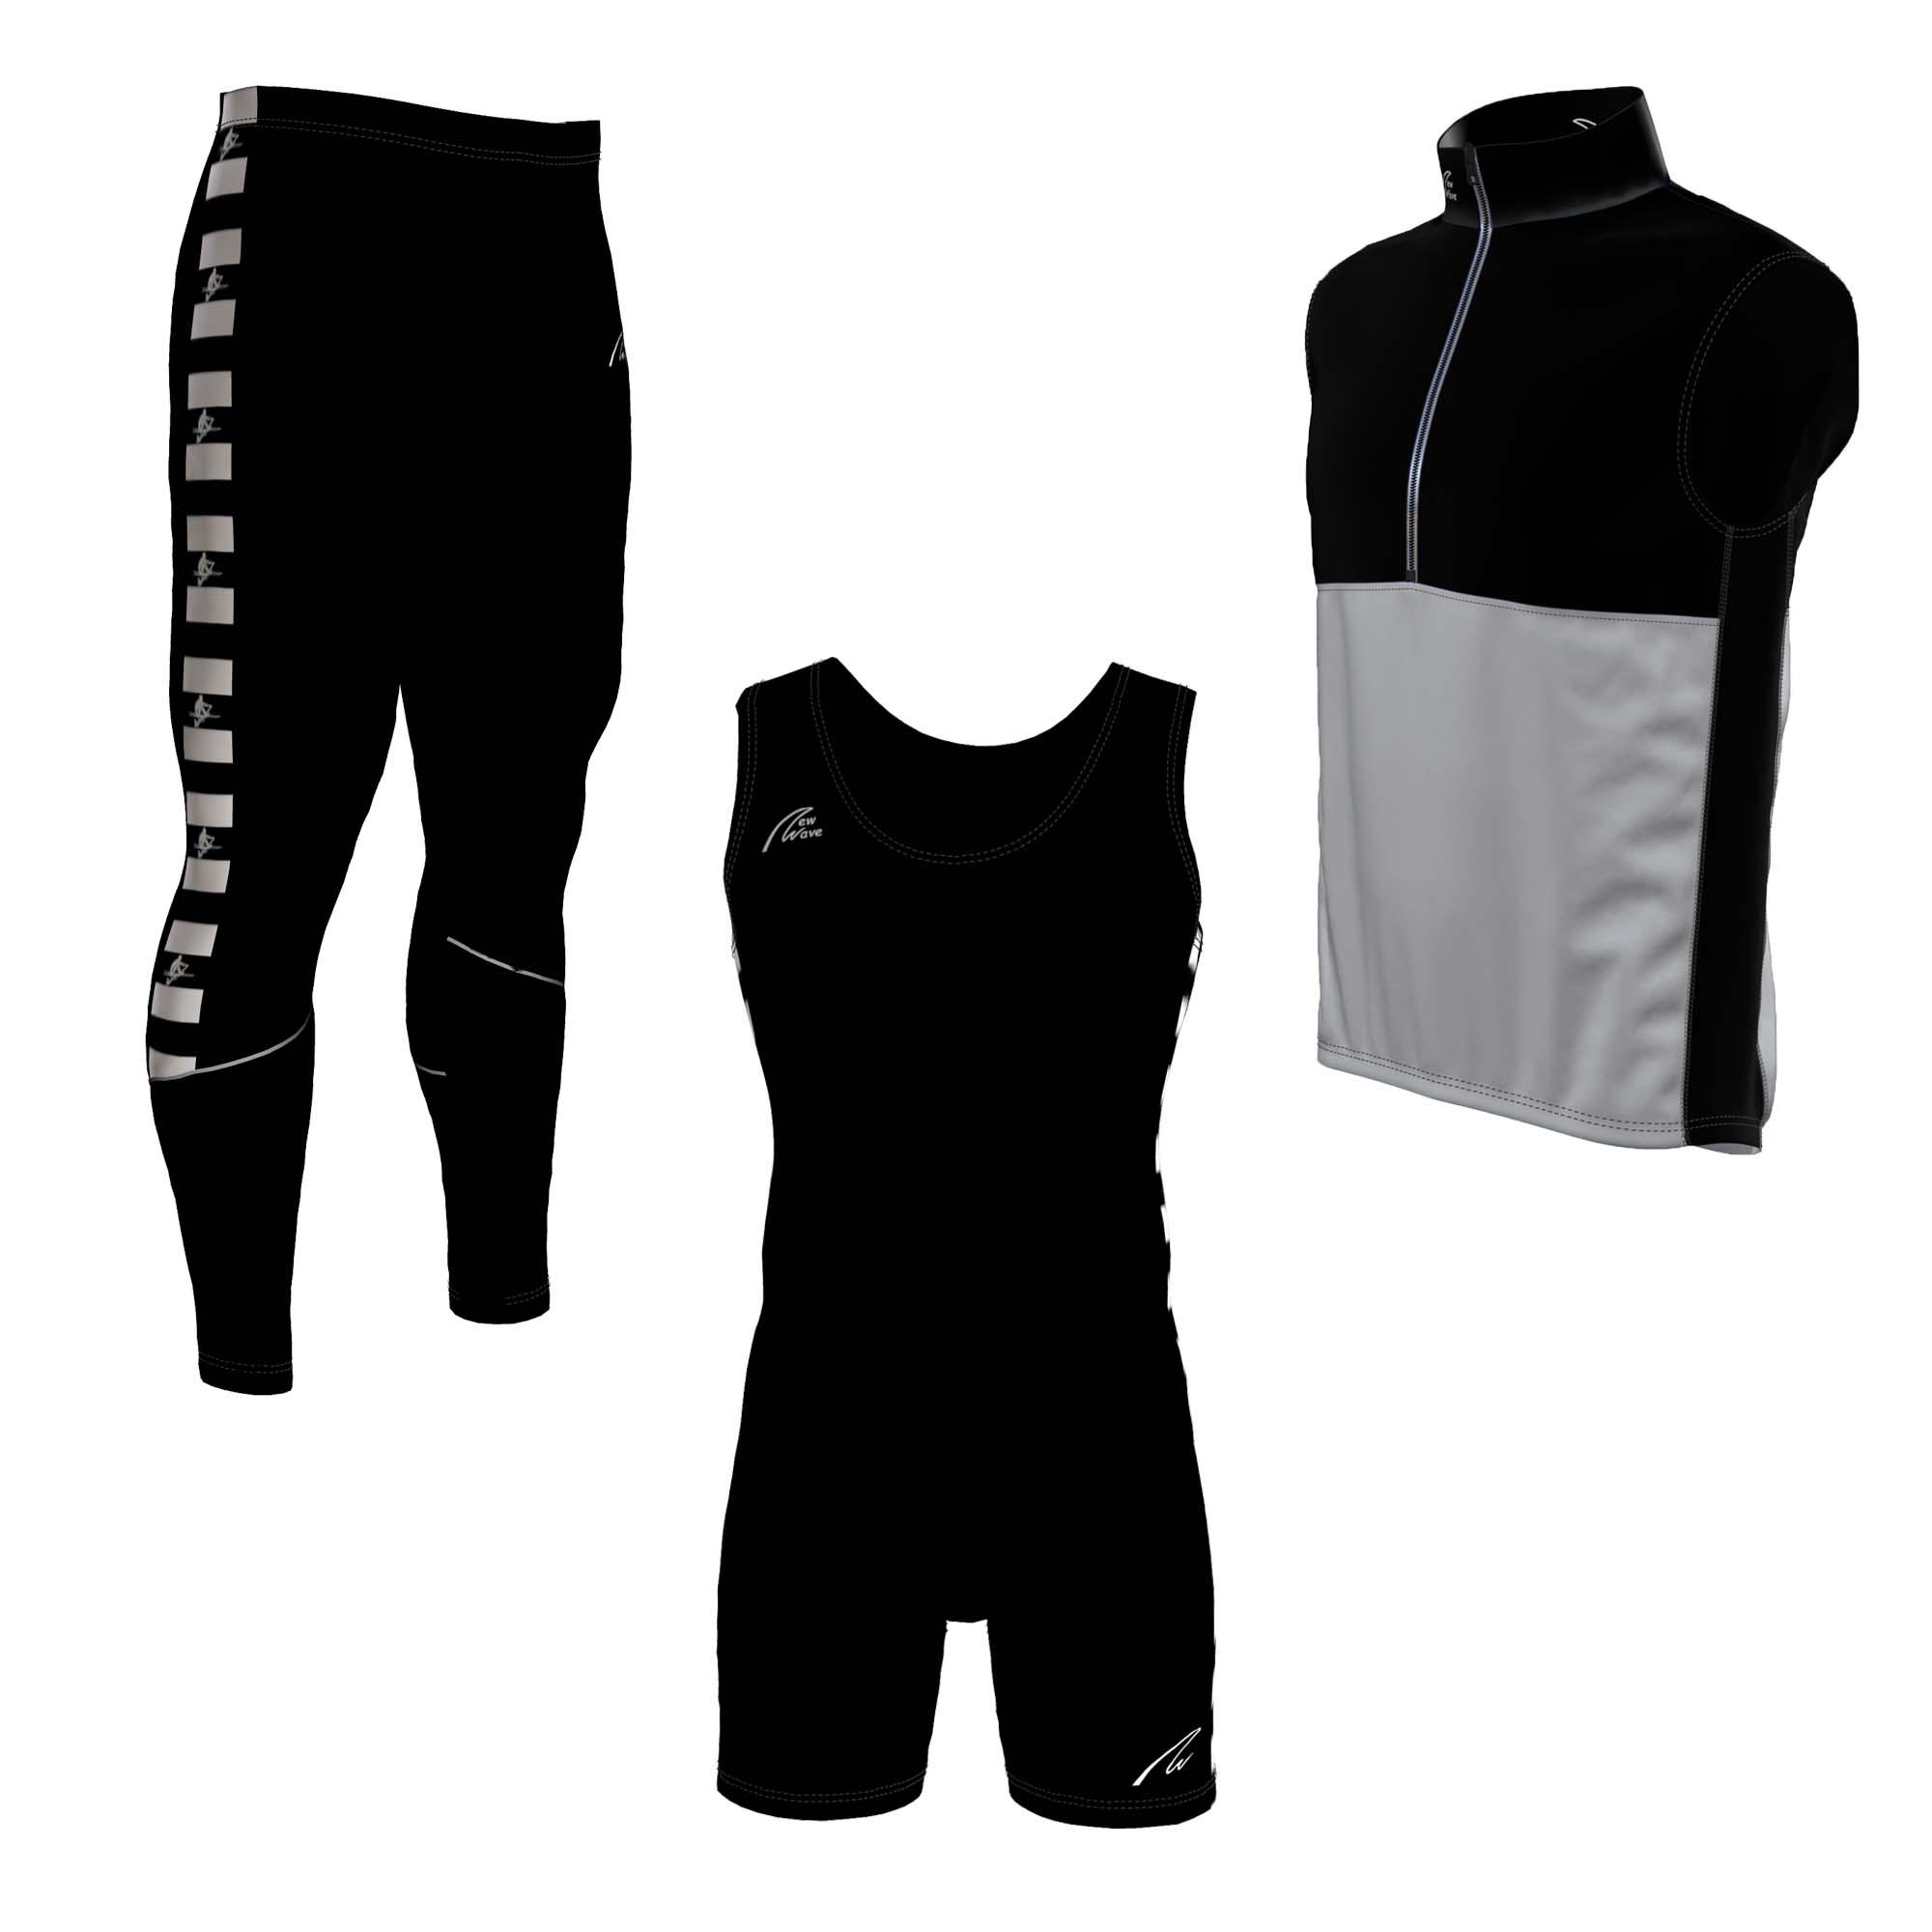 Starterset black Man - Classic Suit, Classic Tight, Davos Vest